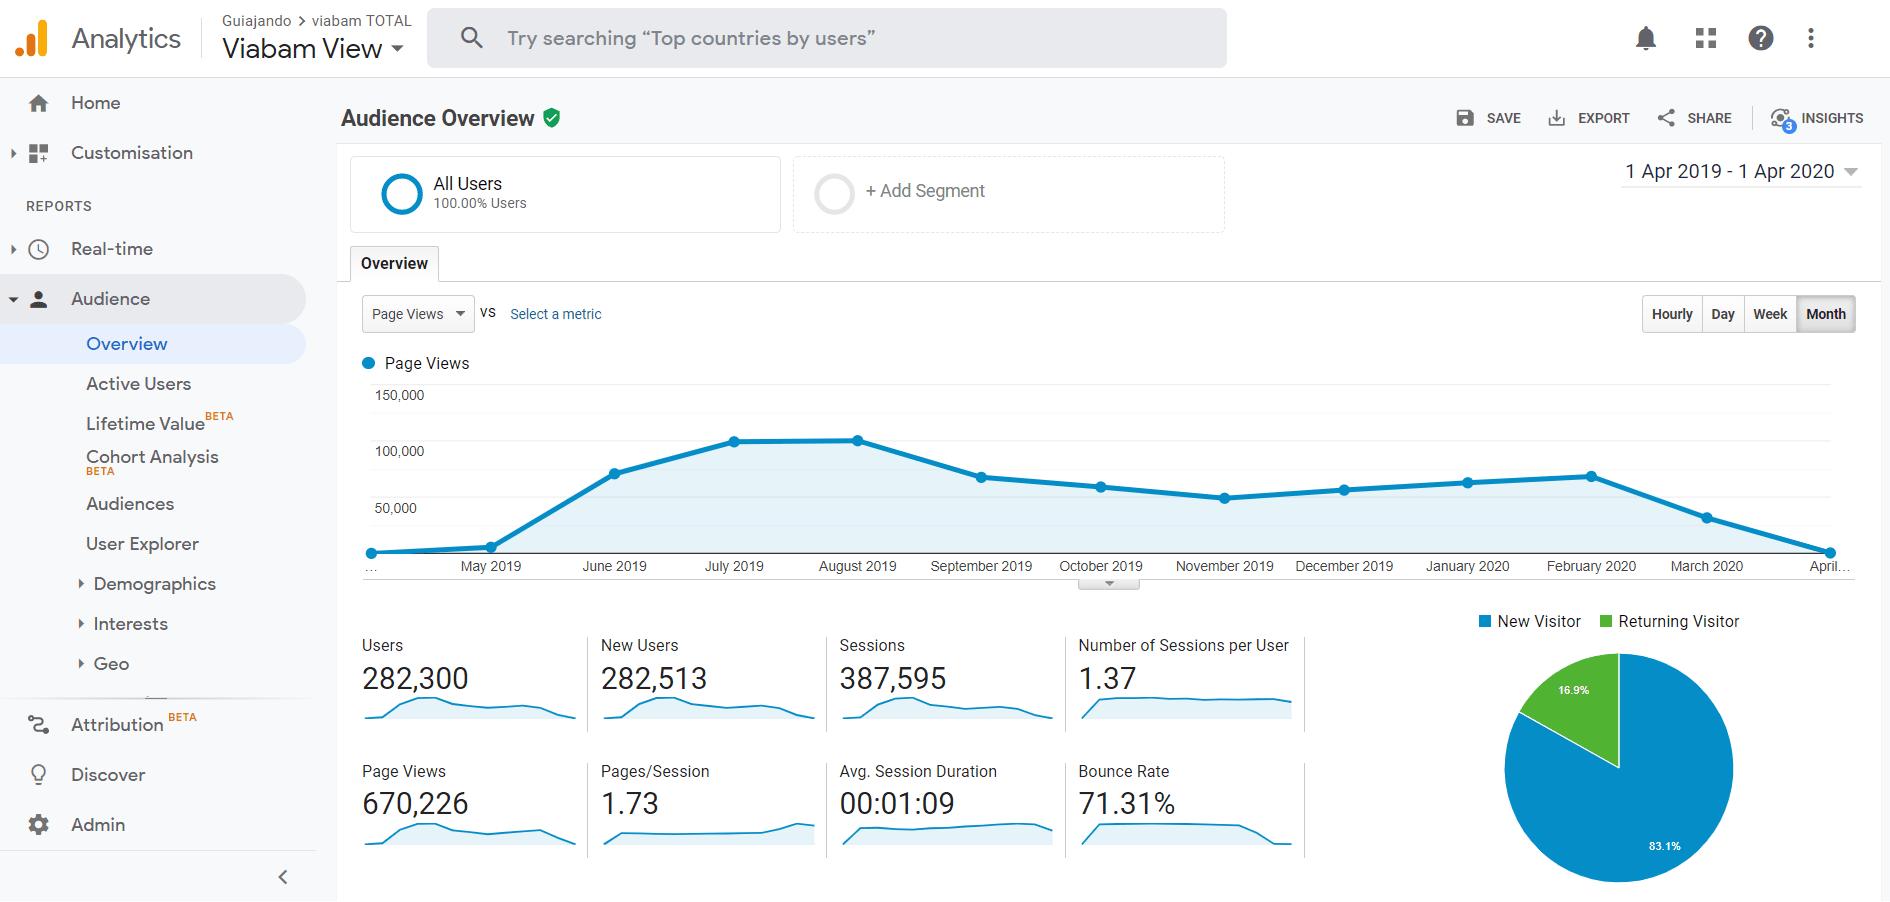 analytics-viabam-2019-2020